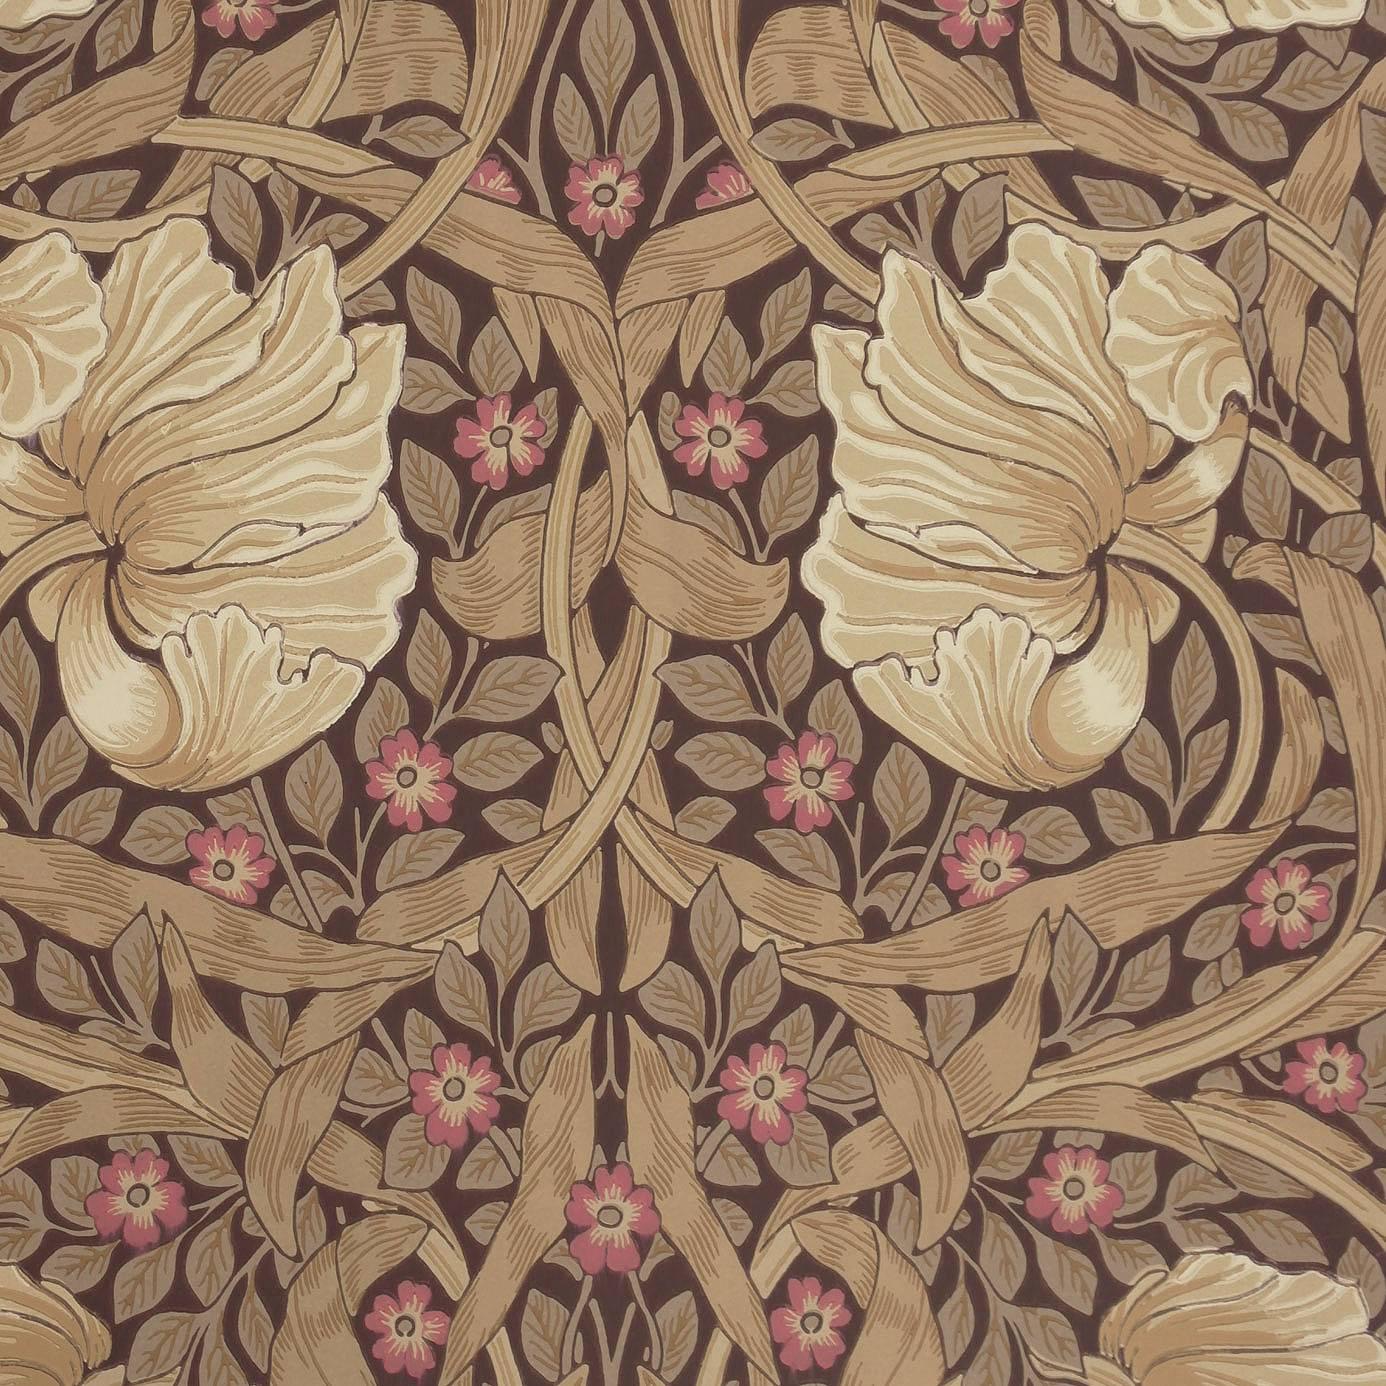 William Morris Wallpaper Artichoke